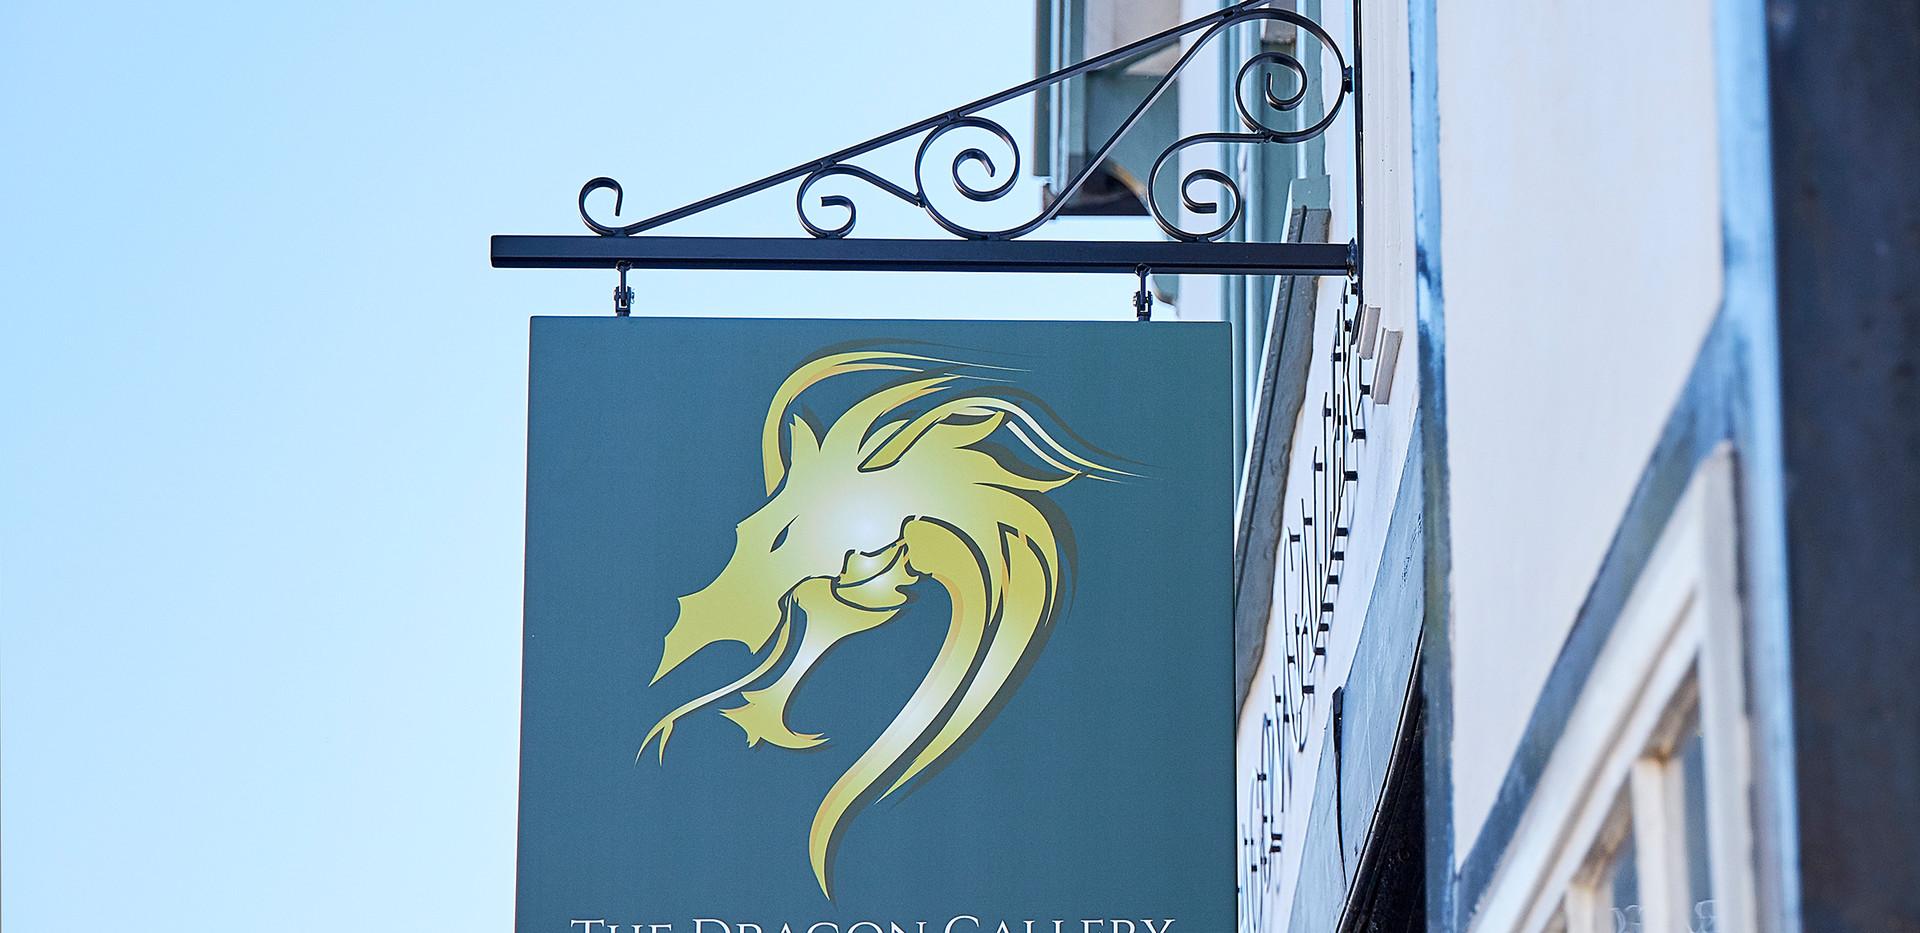 022_Dragon_Gallery.jpg